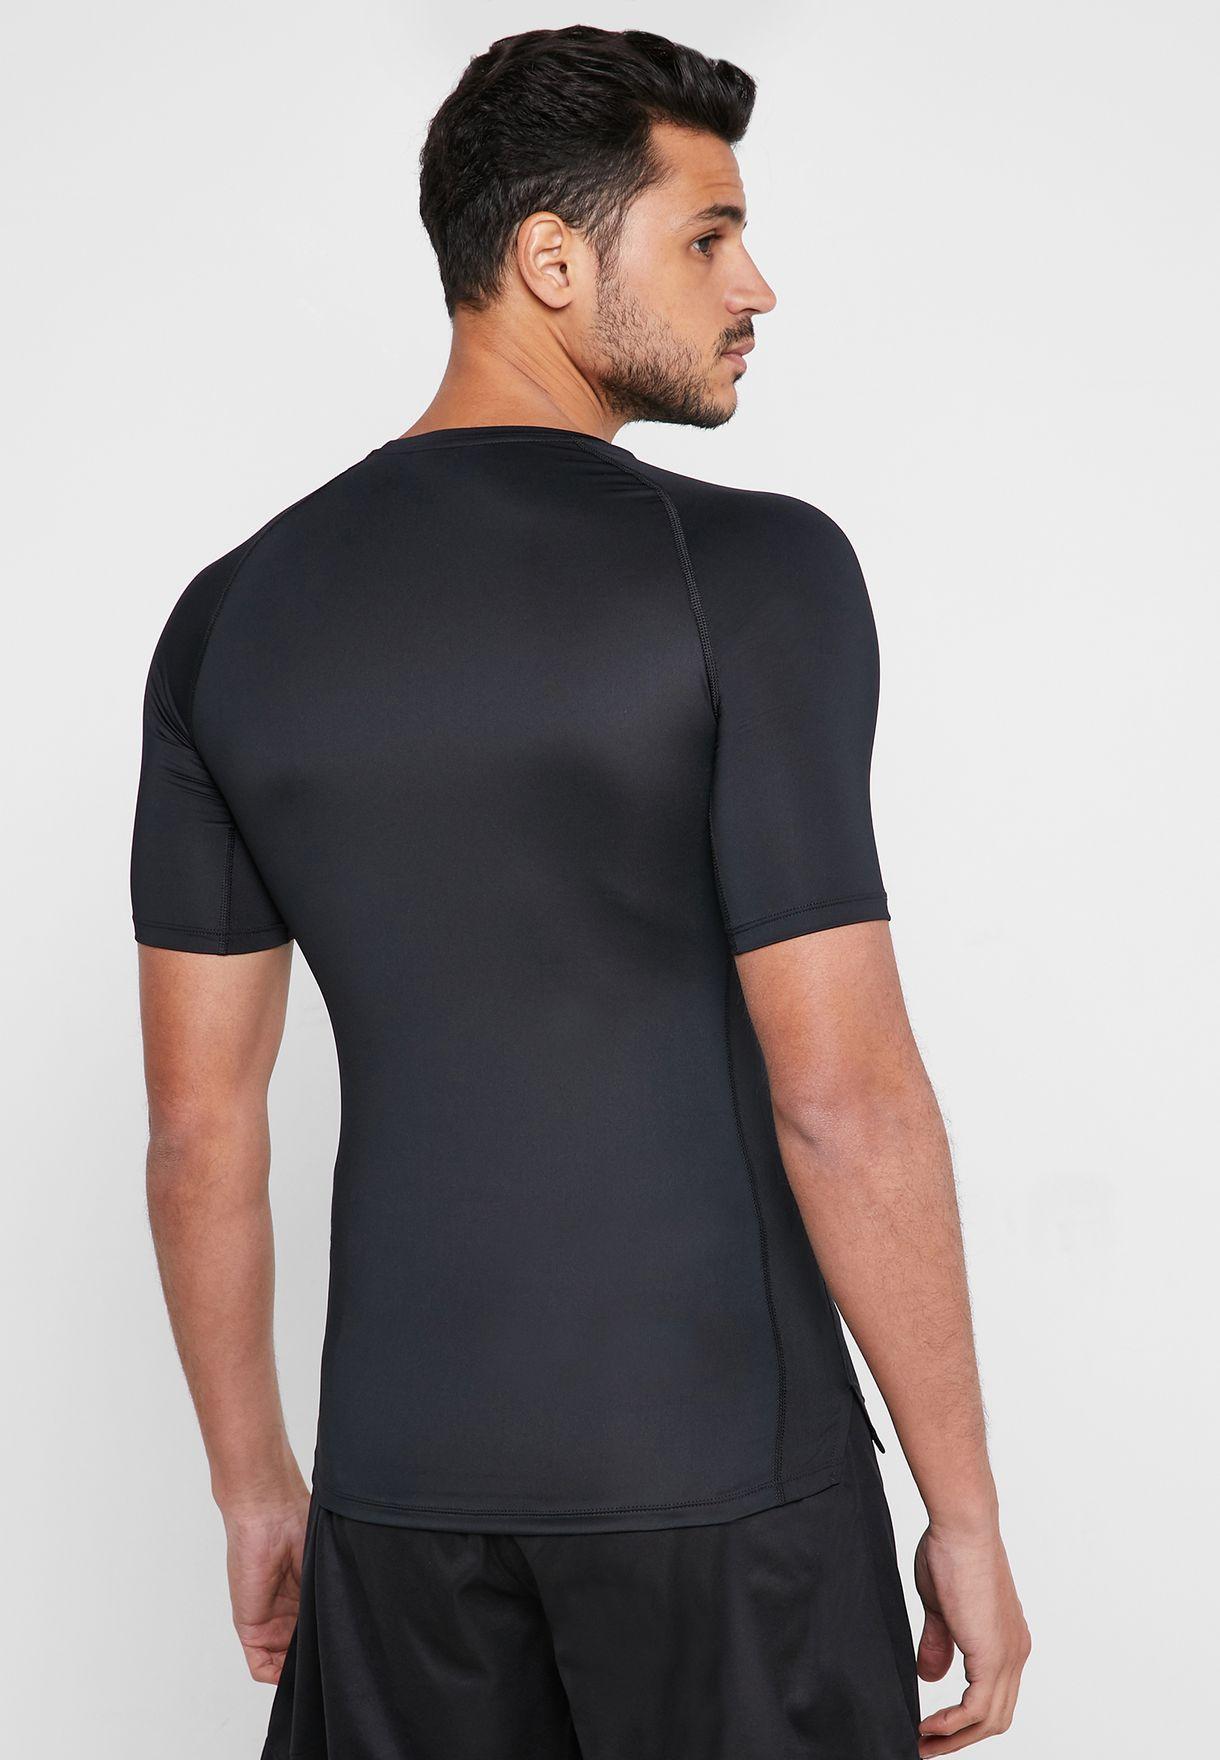 Pro Compression T-Shirt